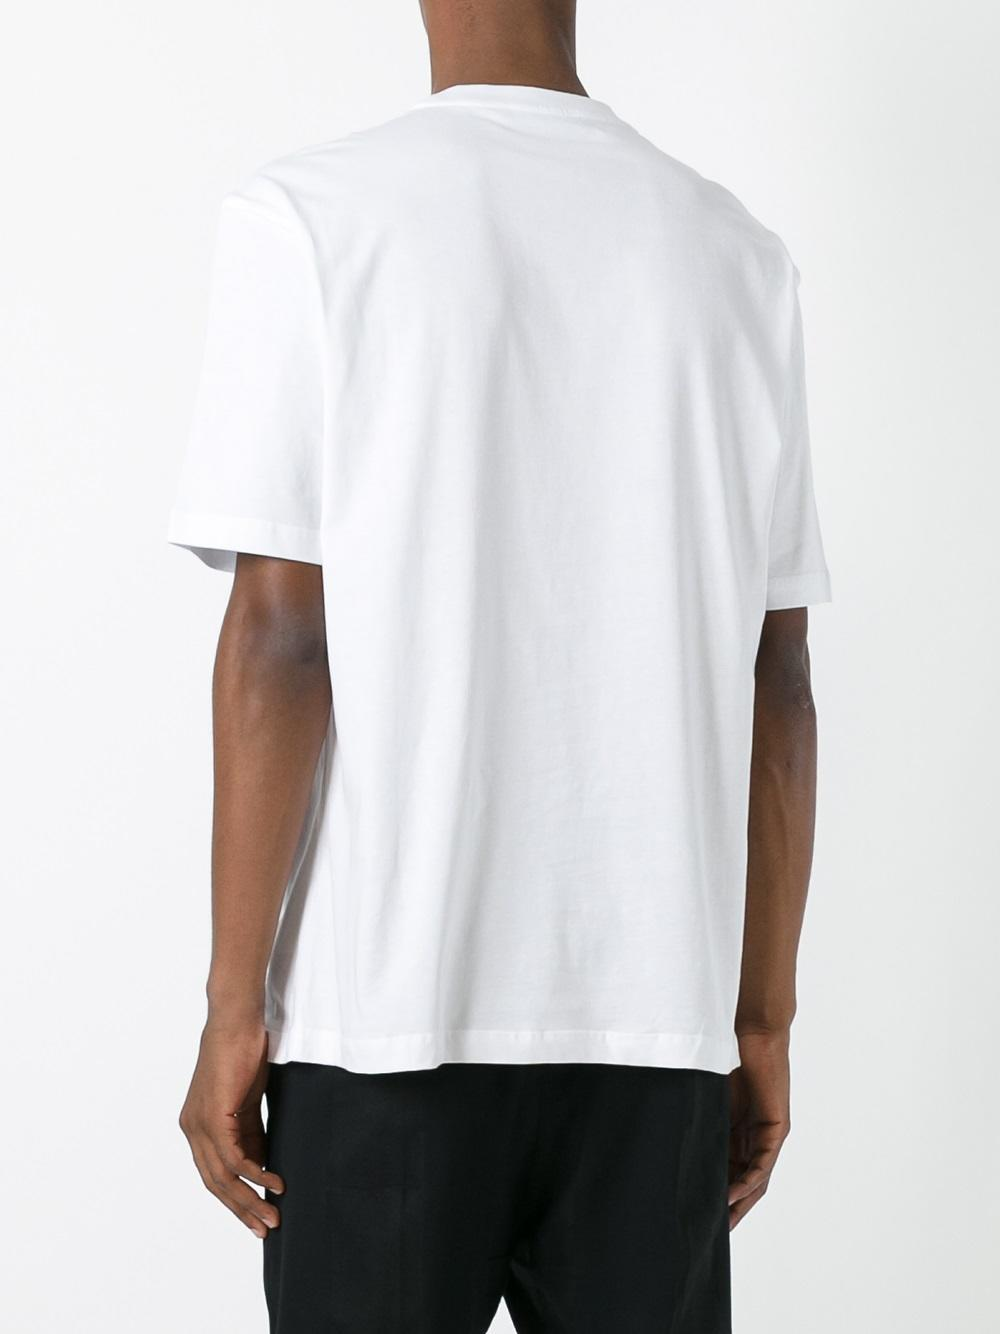 Lyst raf simons x robert mapplethorpe square print t for Raf simons robert mapplethorpe shirt